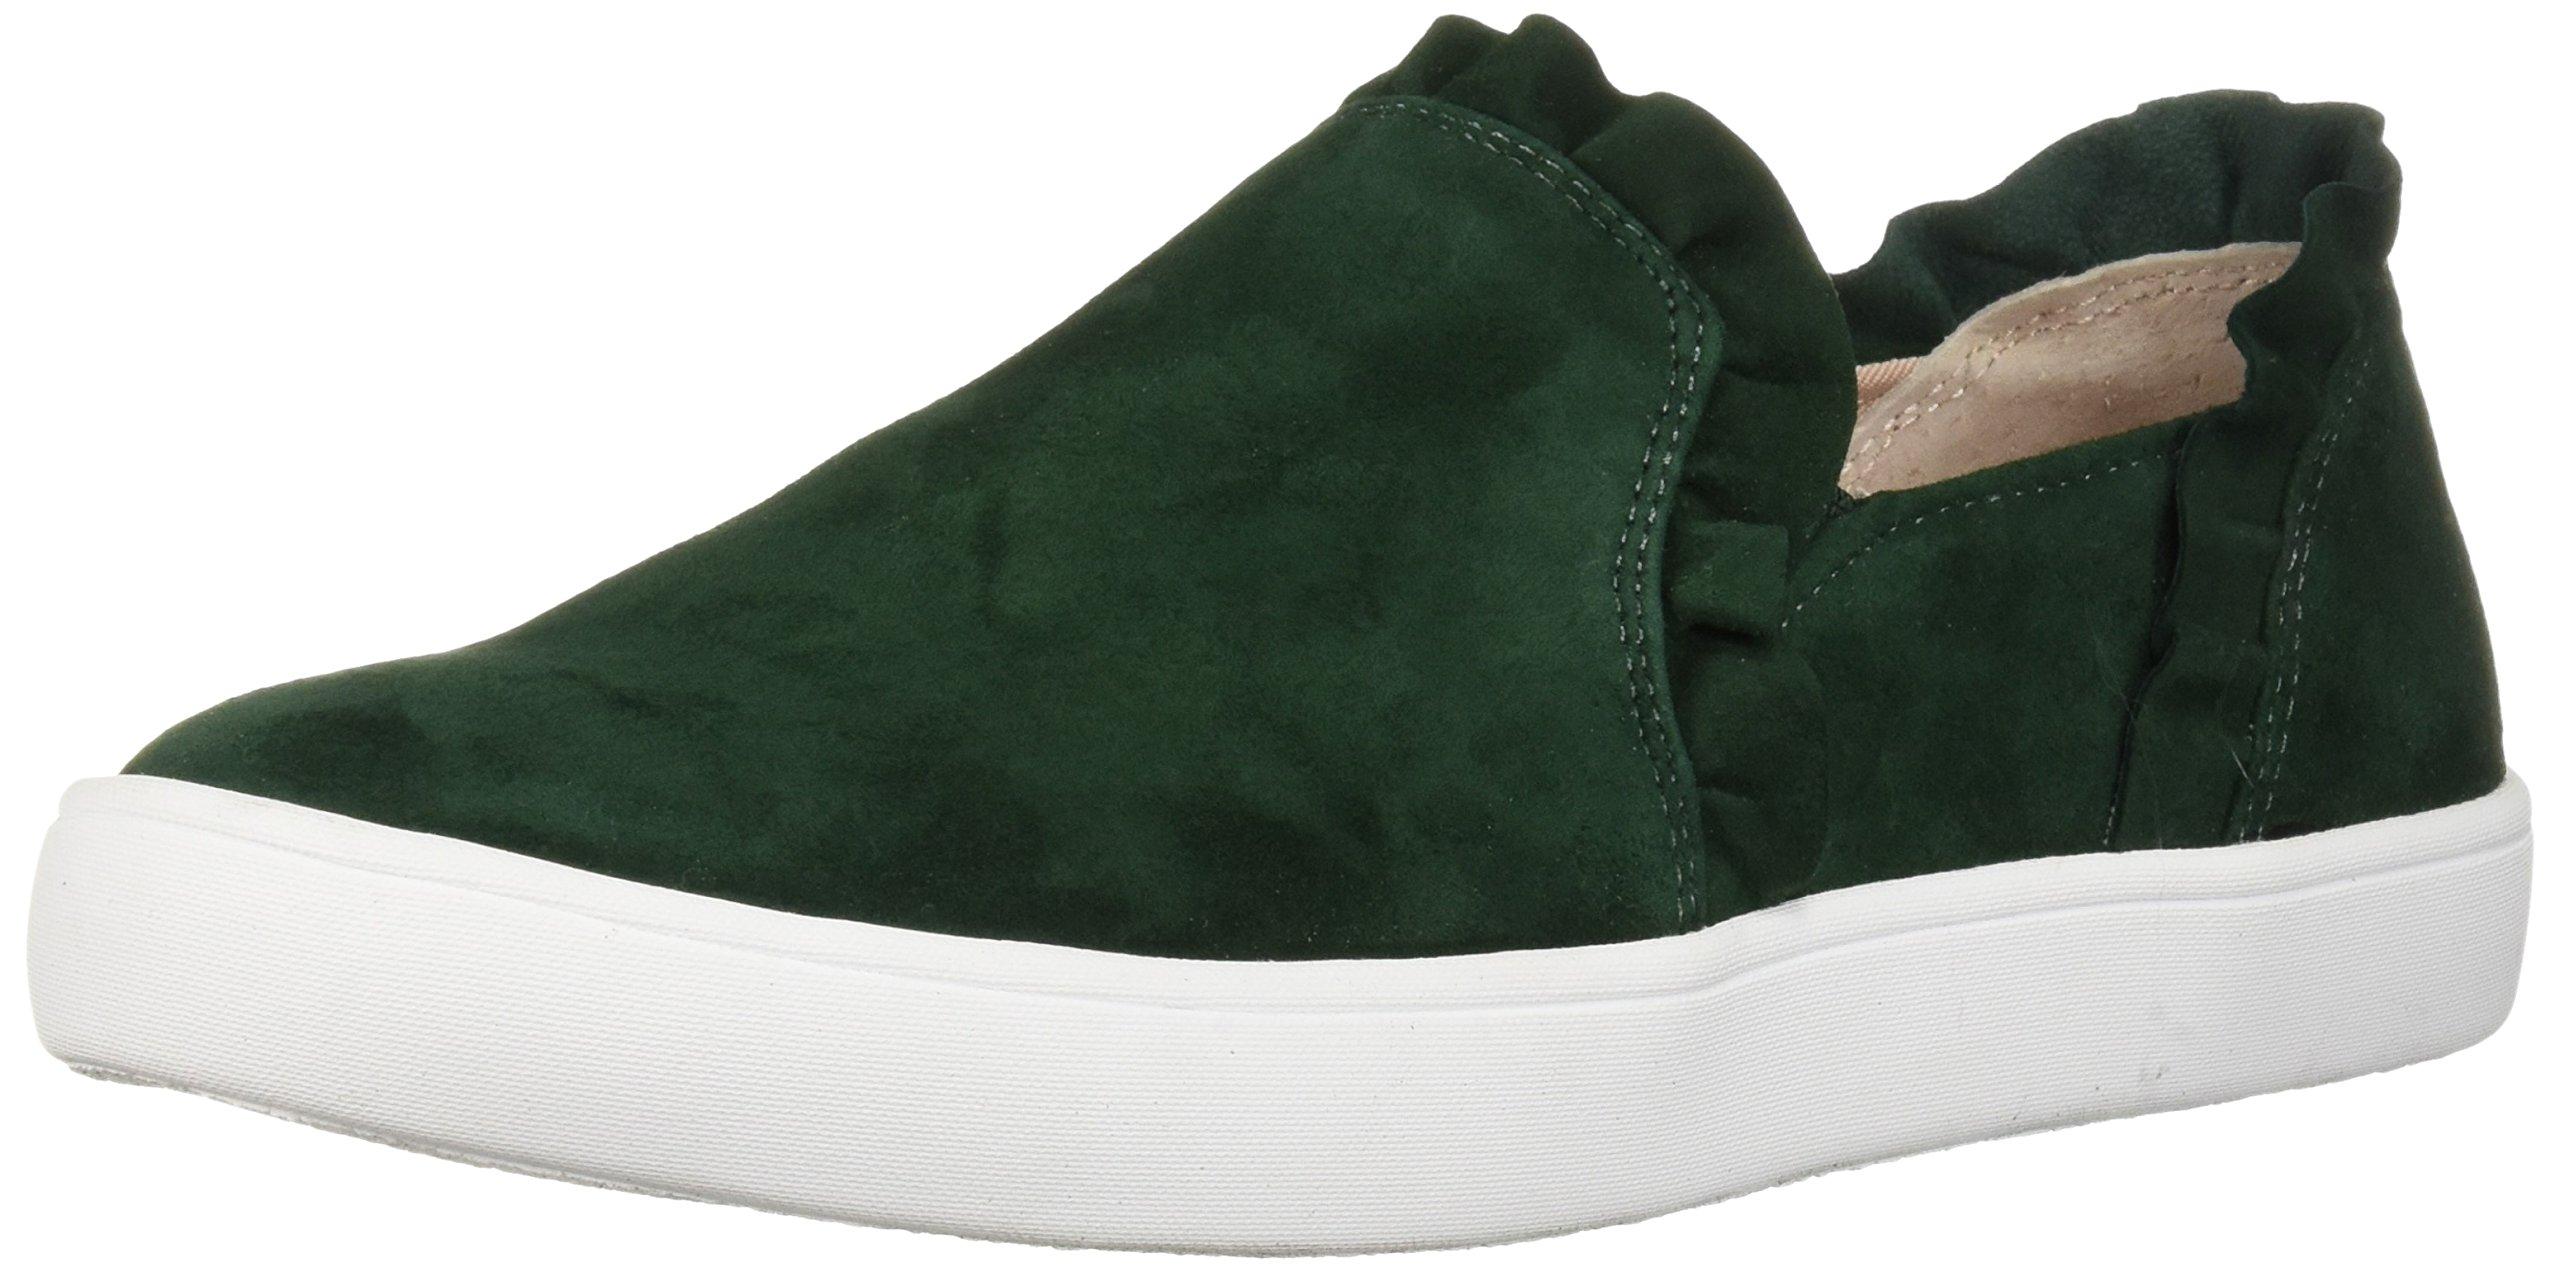 Kate Spade New York Women's Lilly Sneaker, Dark Green, 8 M US